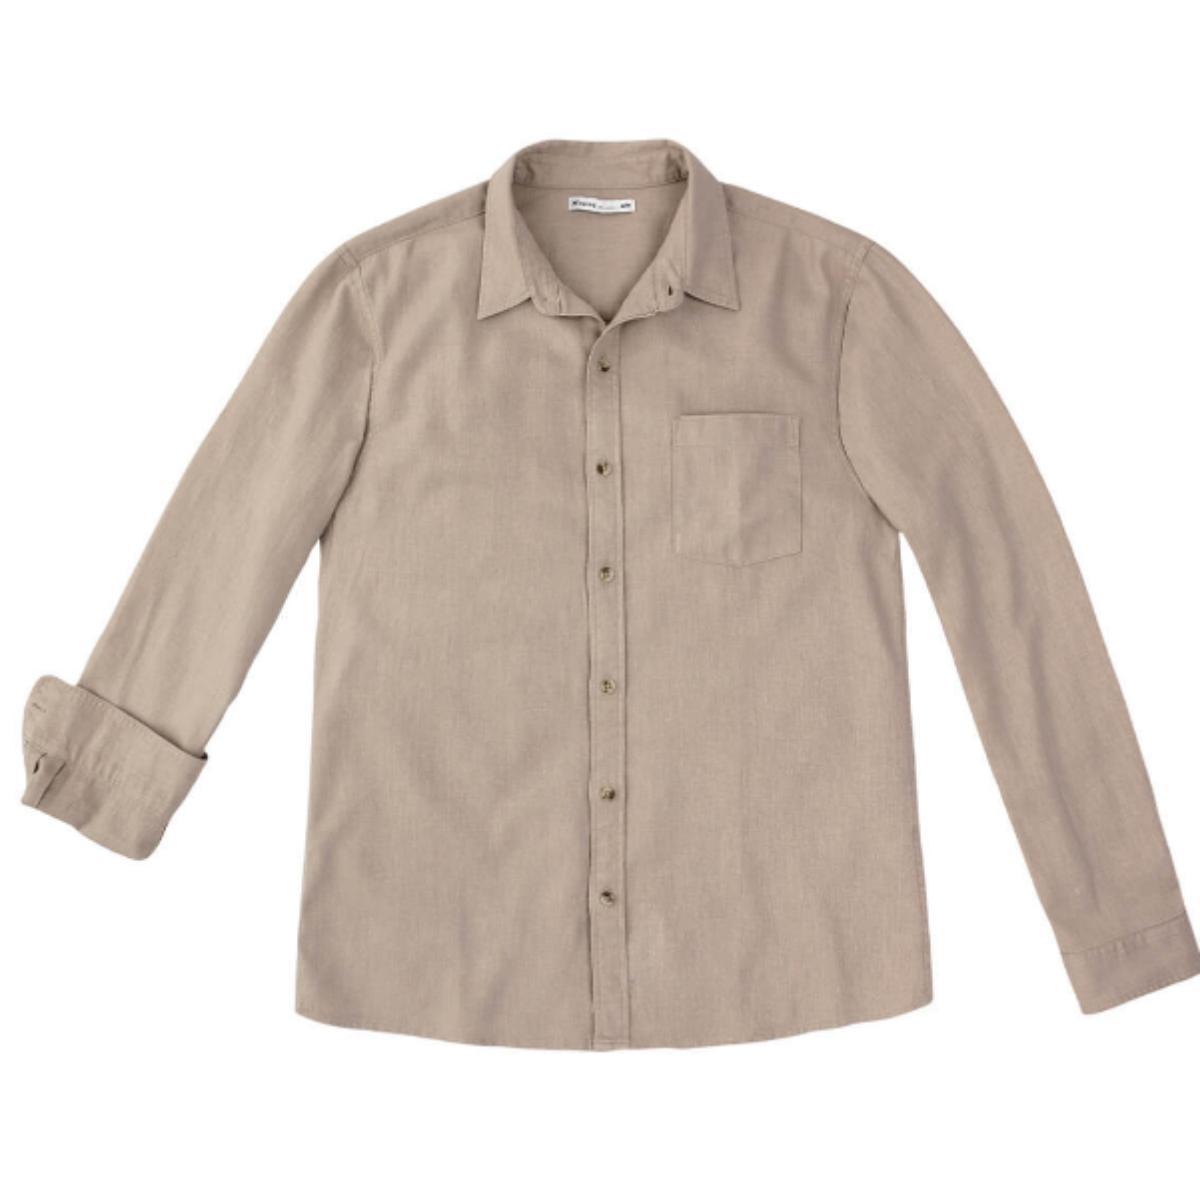 Camisa Masculina Hering K48f 1dsi Bege Escuro